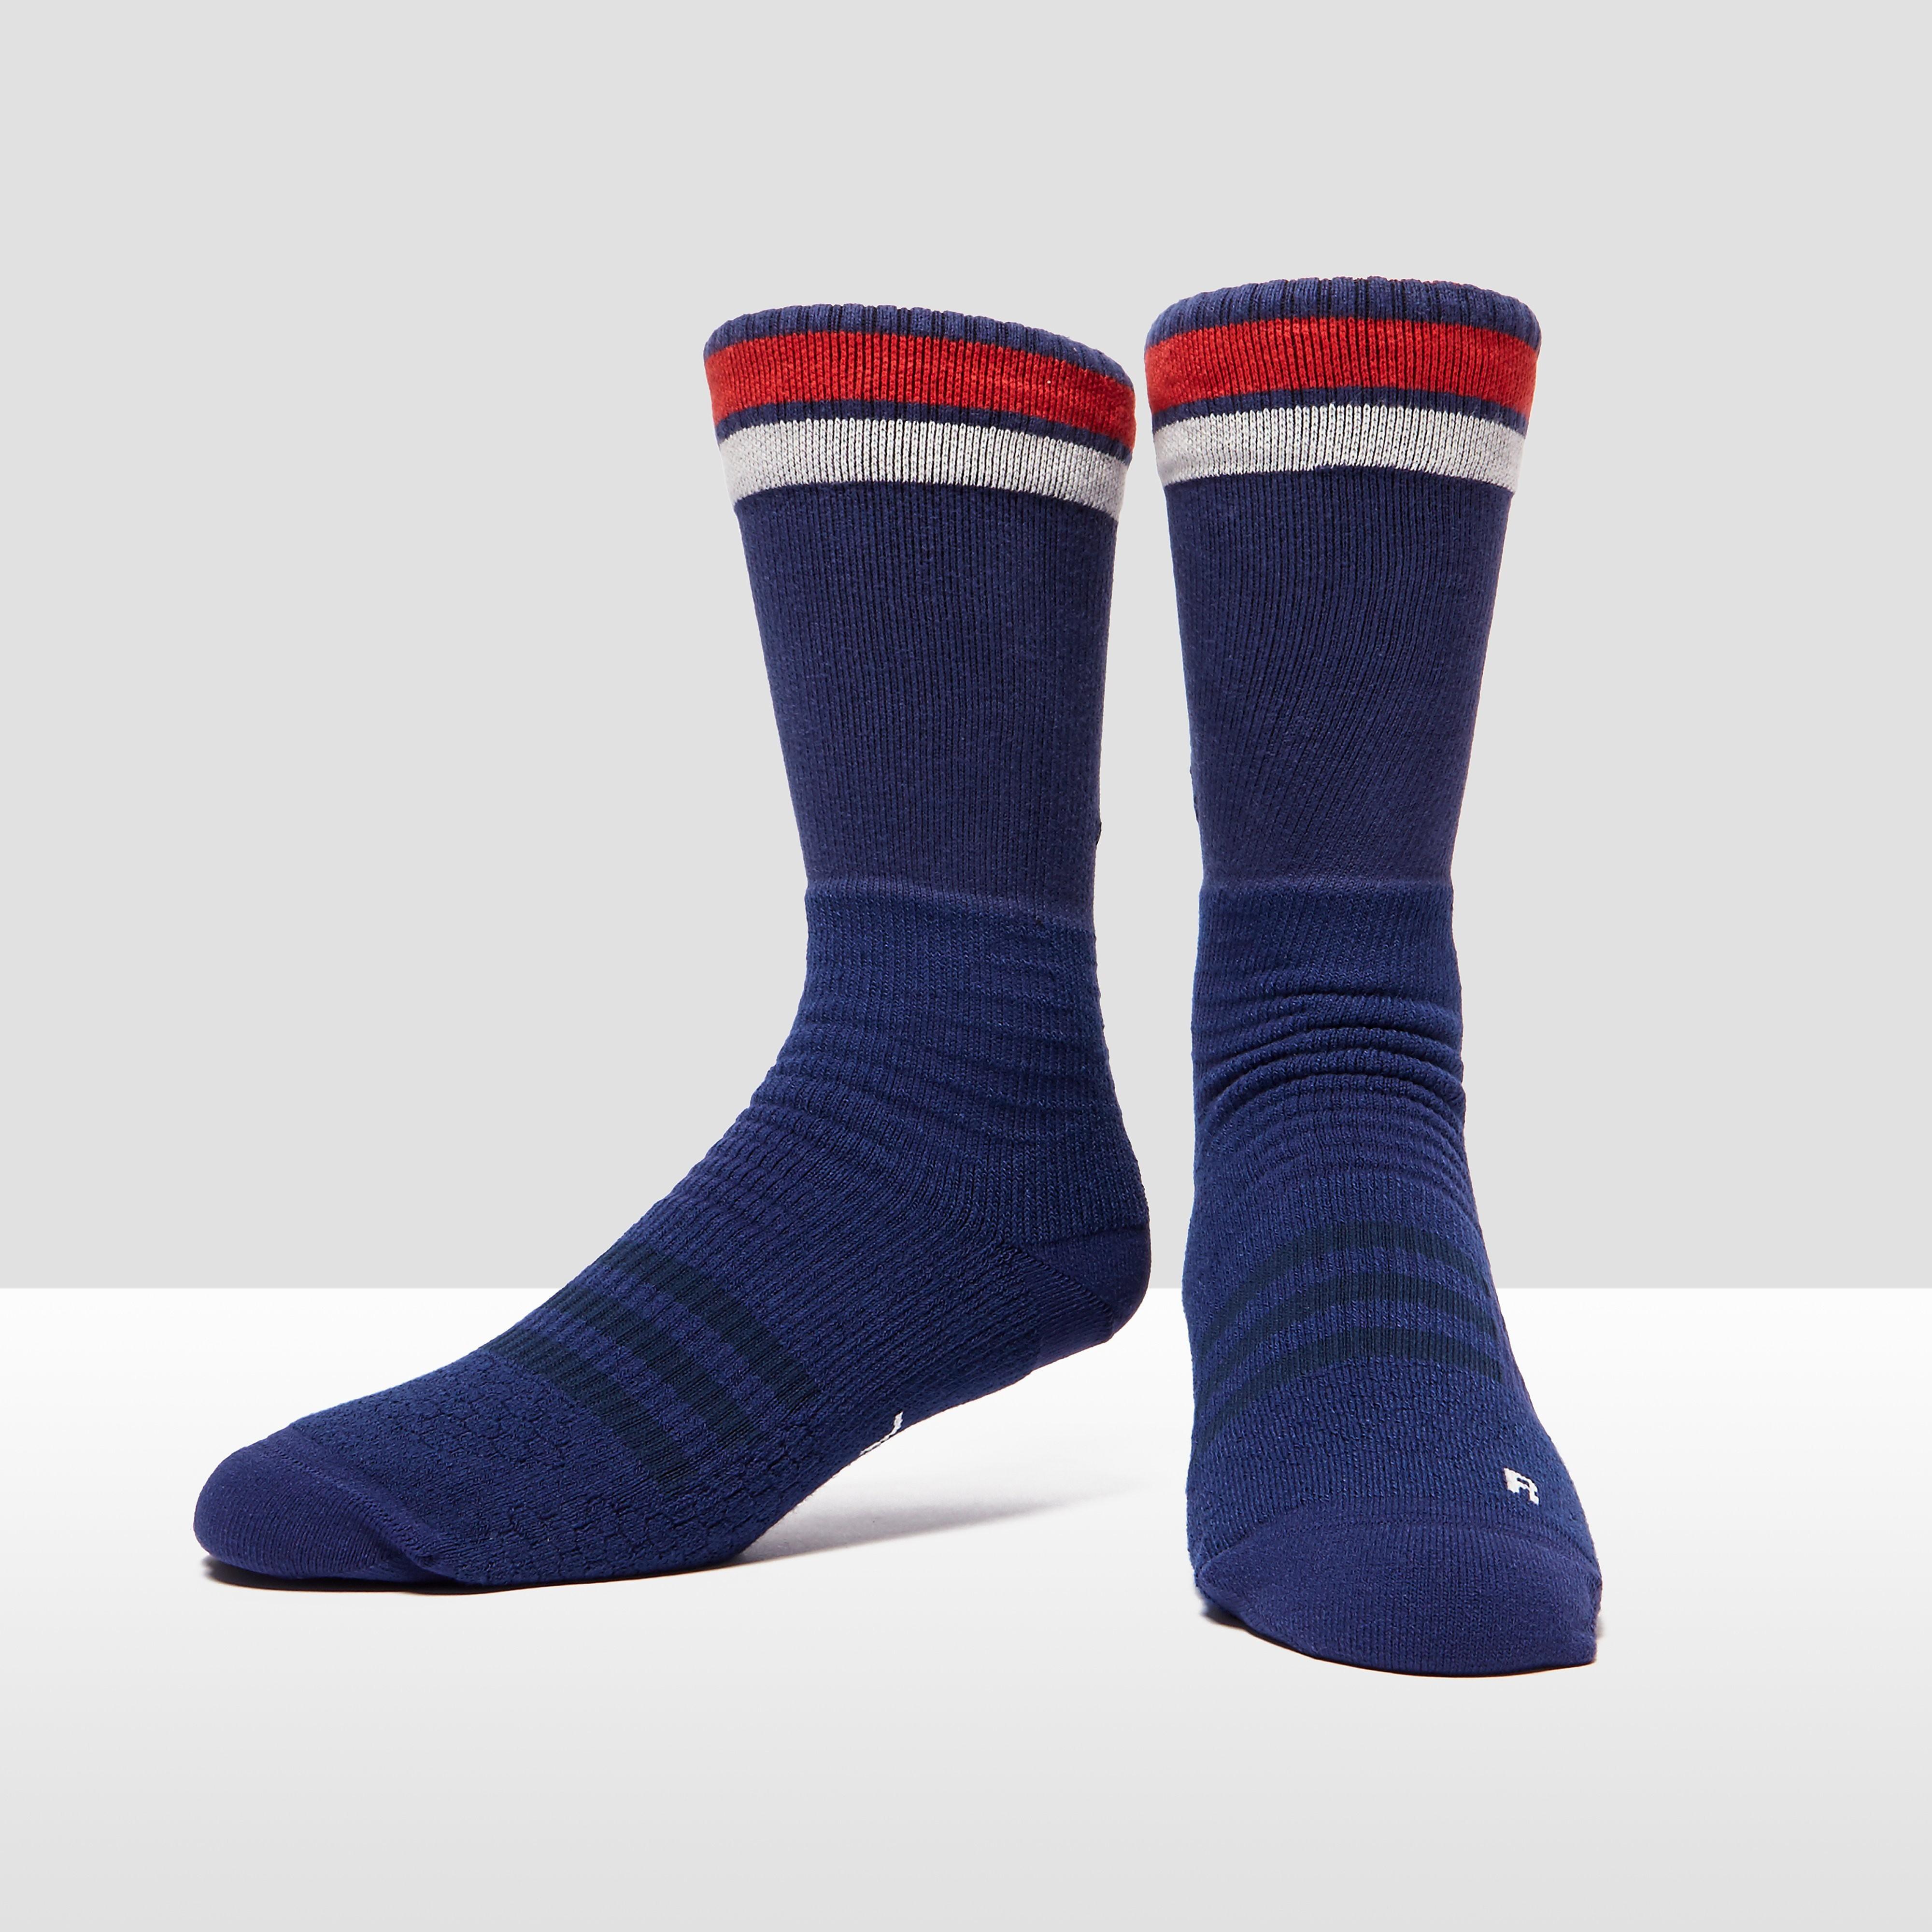 adidas 1 Pair Pharrell Williams Men's ID Crew Socks